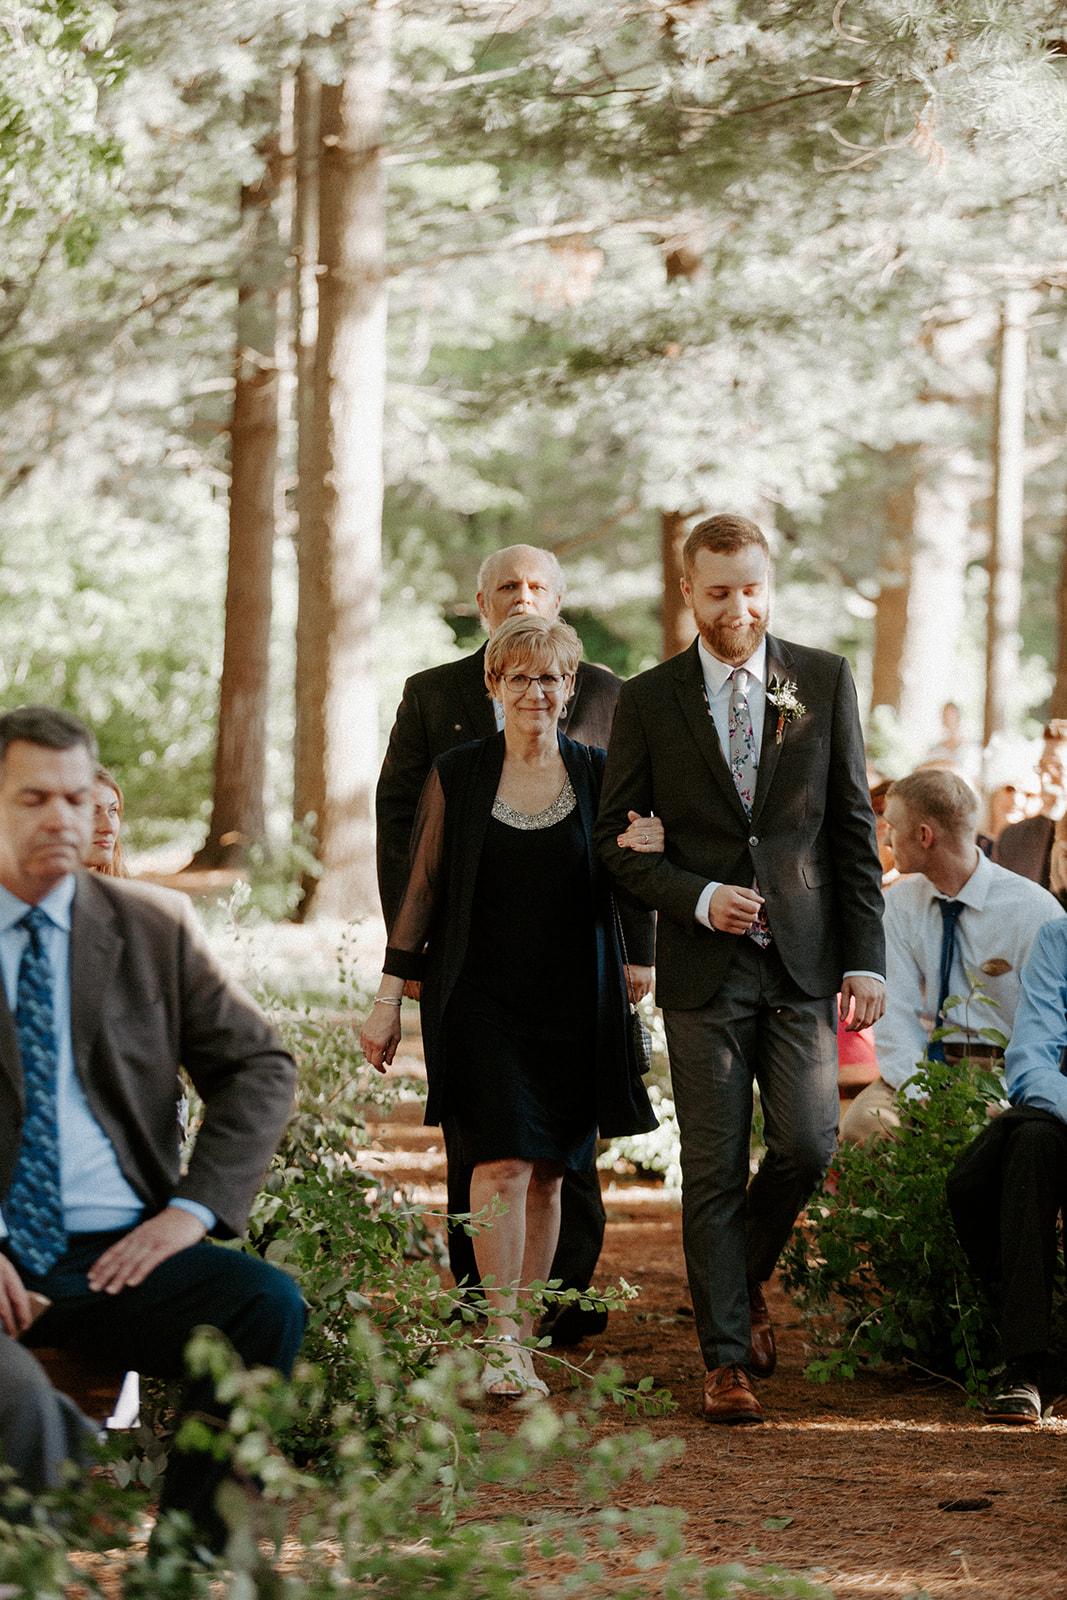 camp_wokanda_peoria_illinois_wedding_photographer_wright_photographs_bliese_0181.jpg